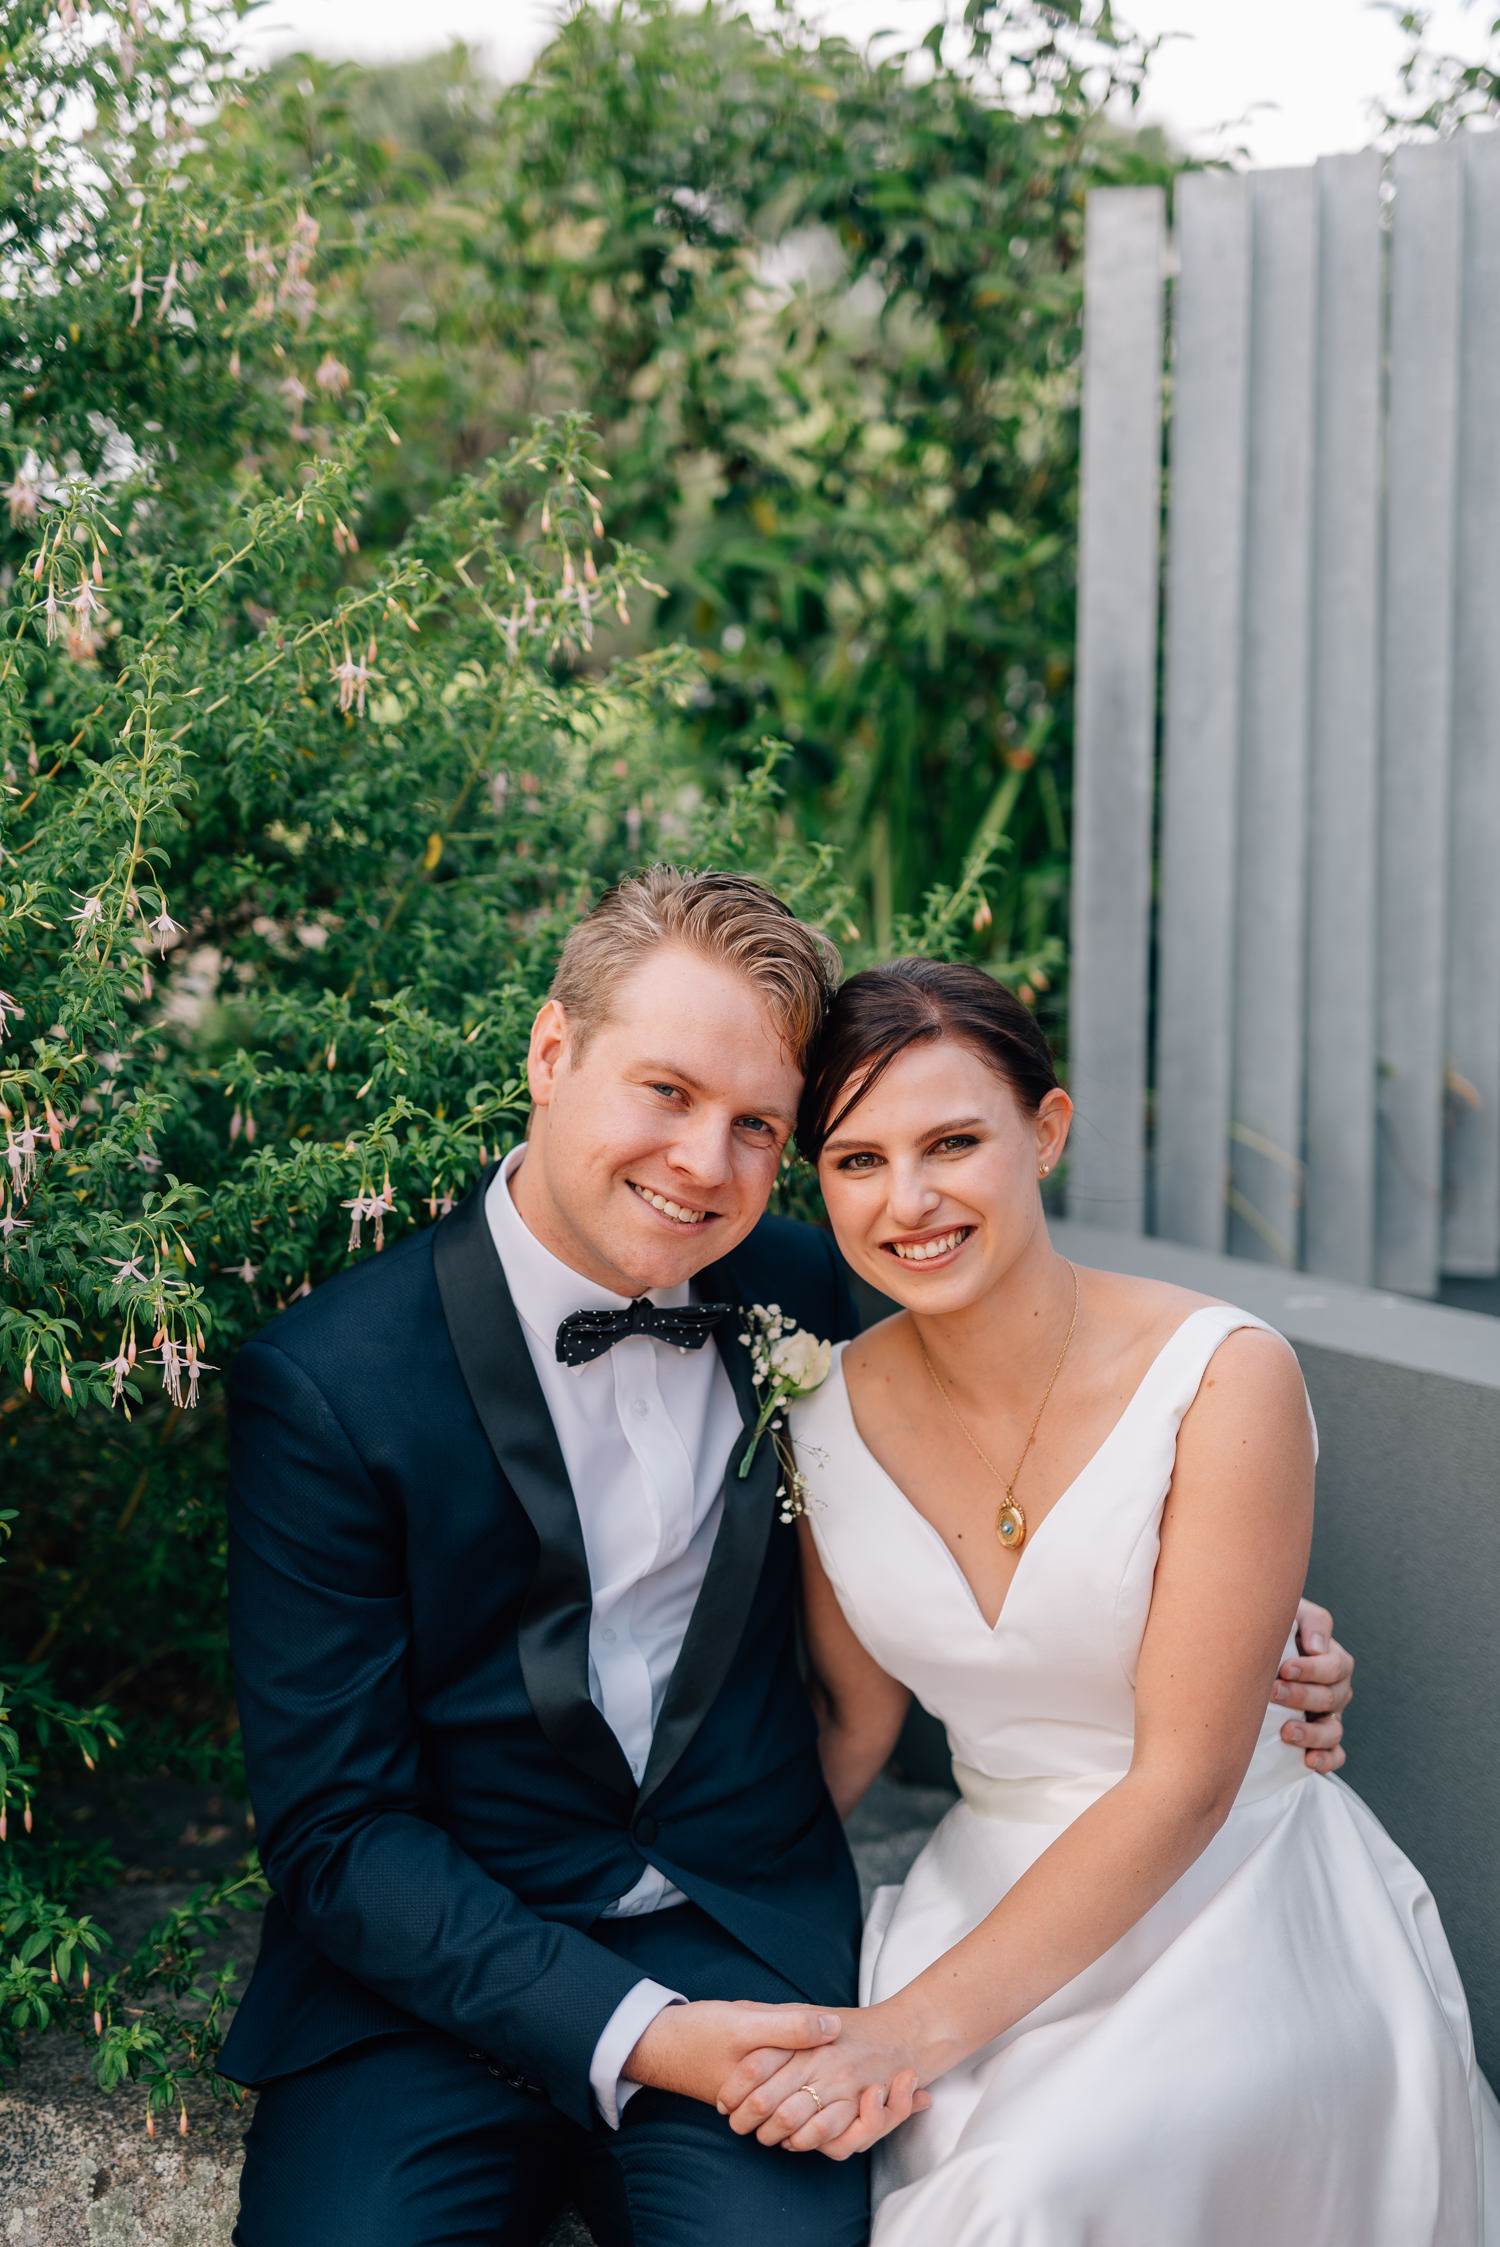 Josef-Chromy-Wedding-Photographer-72.jpg